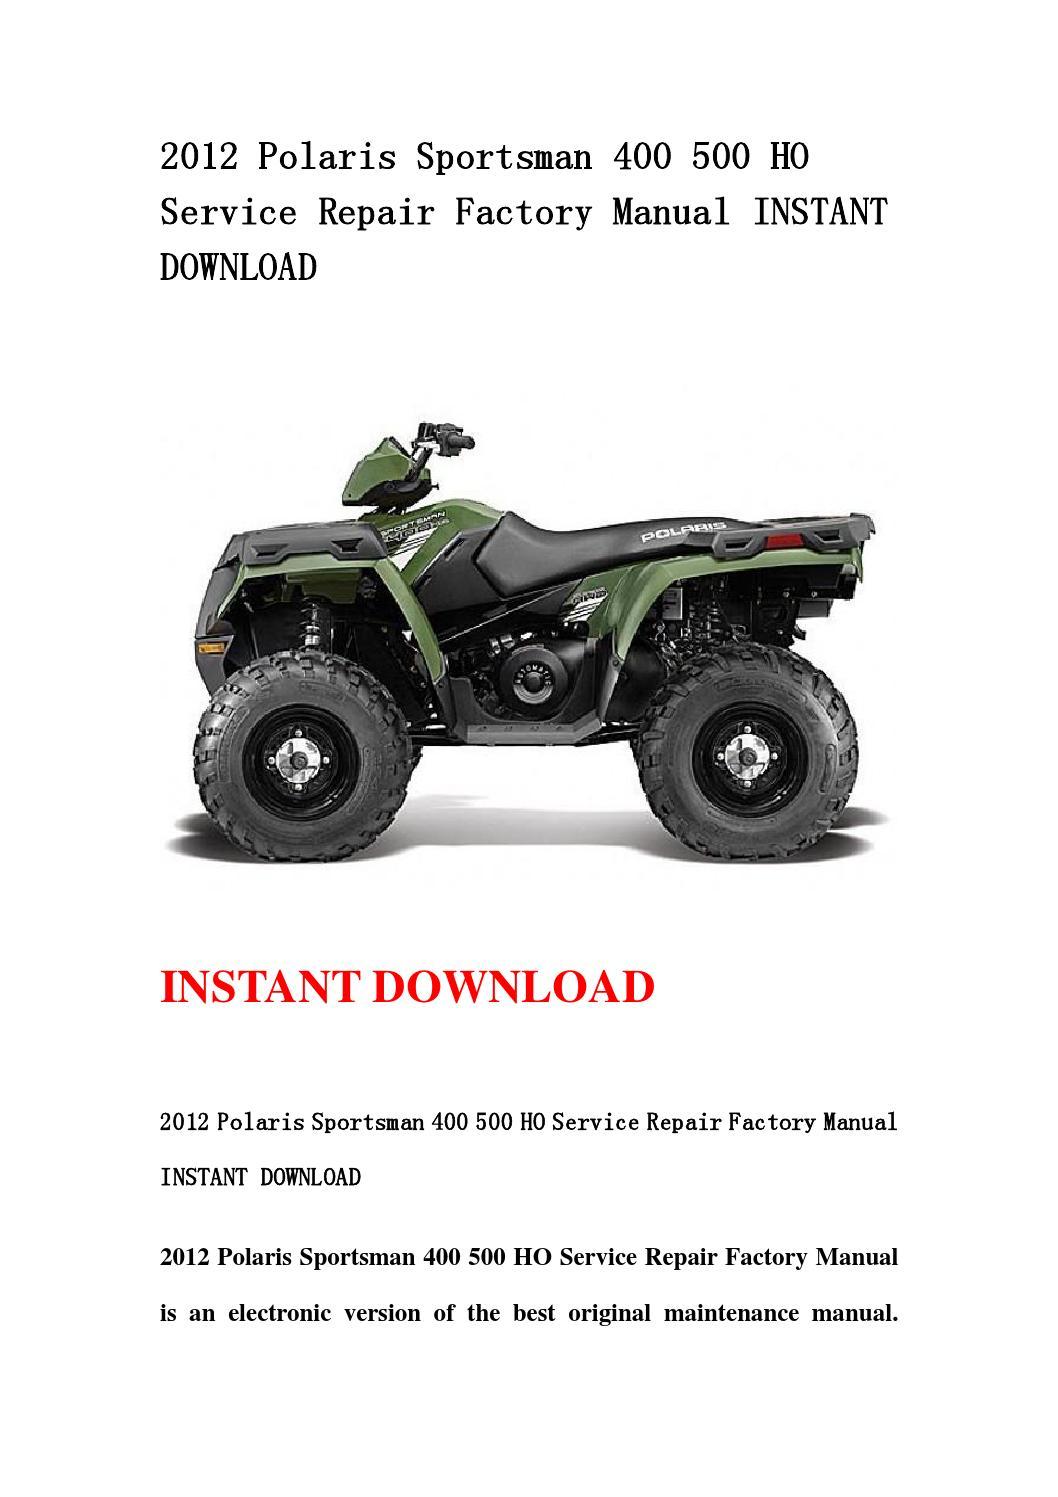 2012 polaris sportsman 500 ho service manual